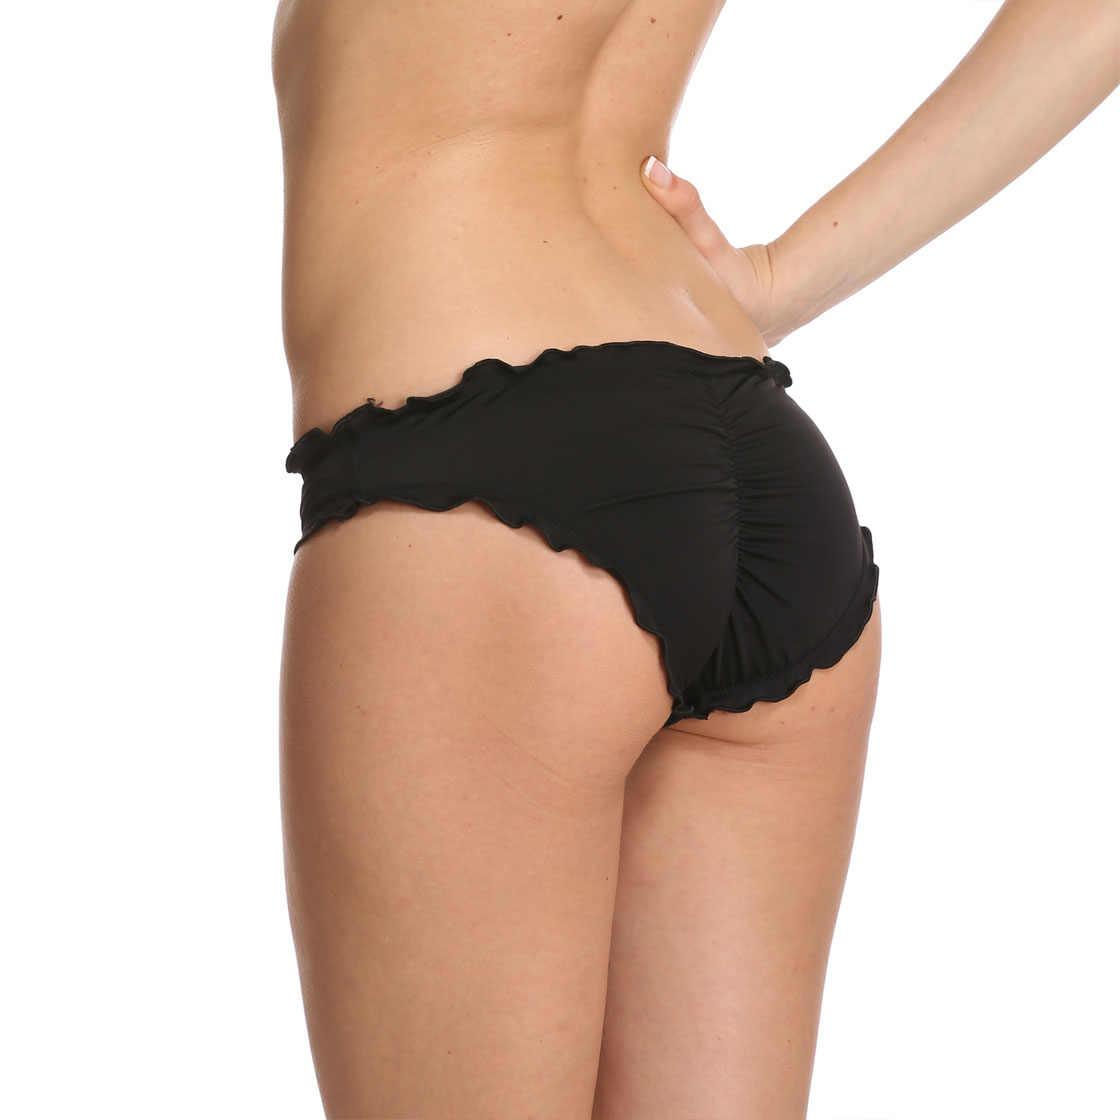 Vrouw Bikini Bottom Lage Taille Zwembroek voor Meisje Zwemmen Badpak Zwart Biquini Braziliaanse Bottoms Sexy badmode Thong bodems